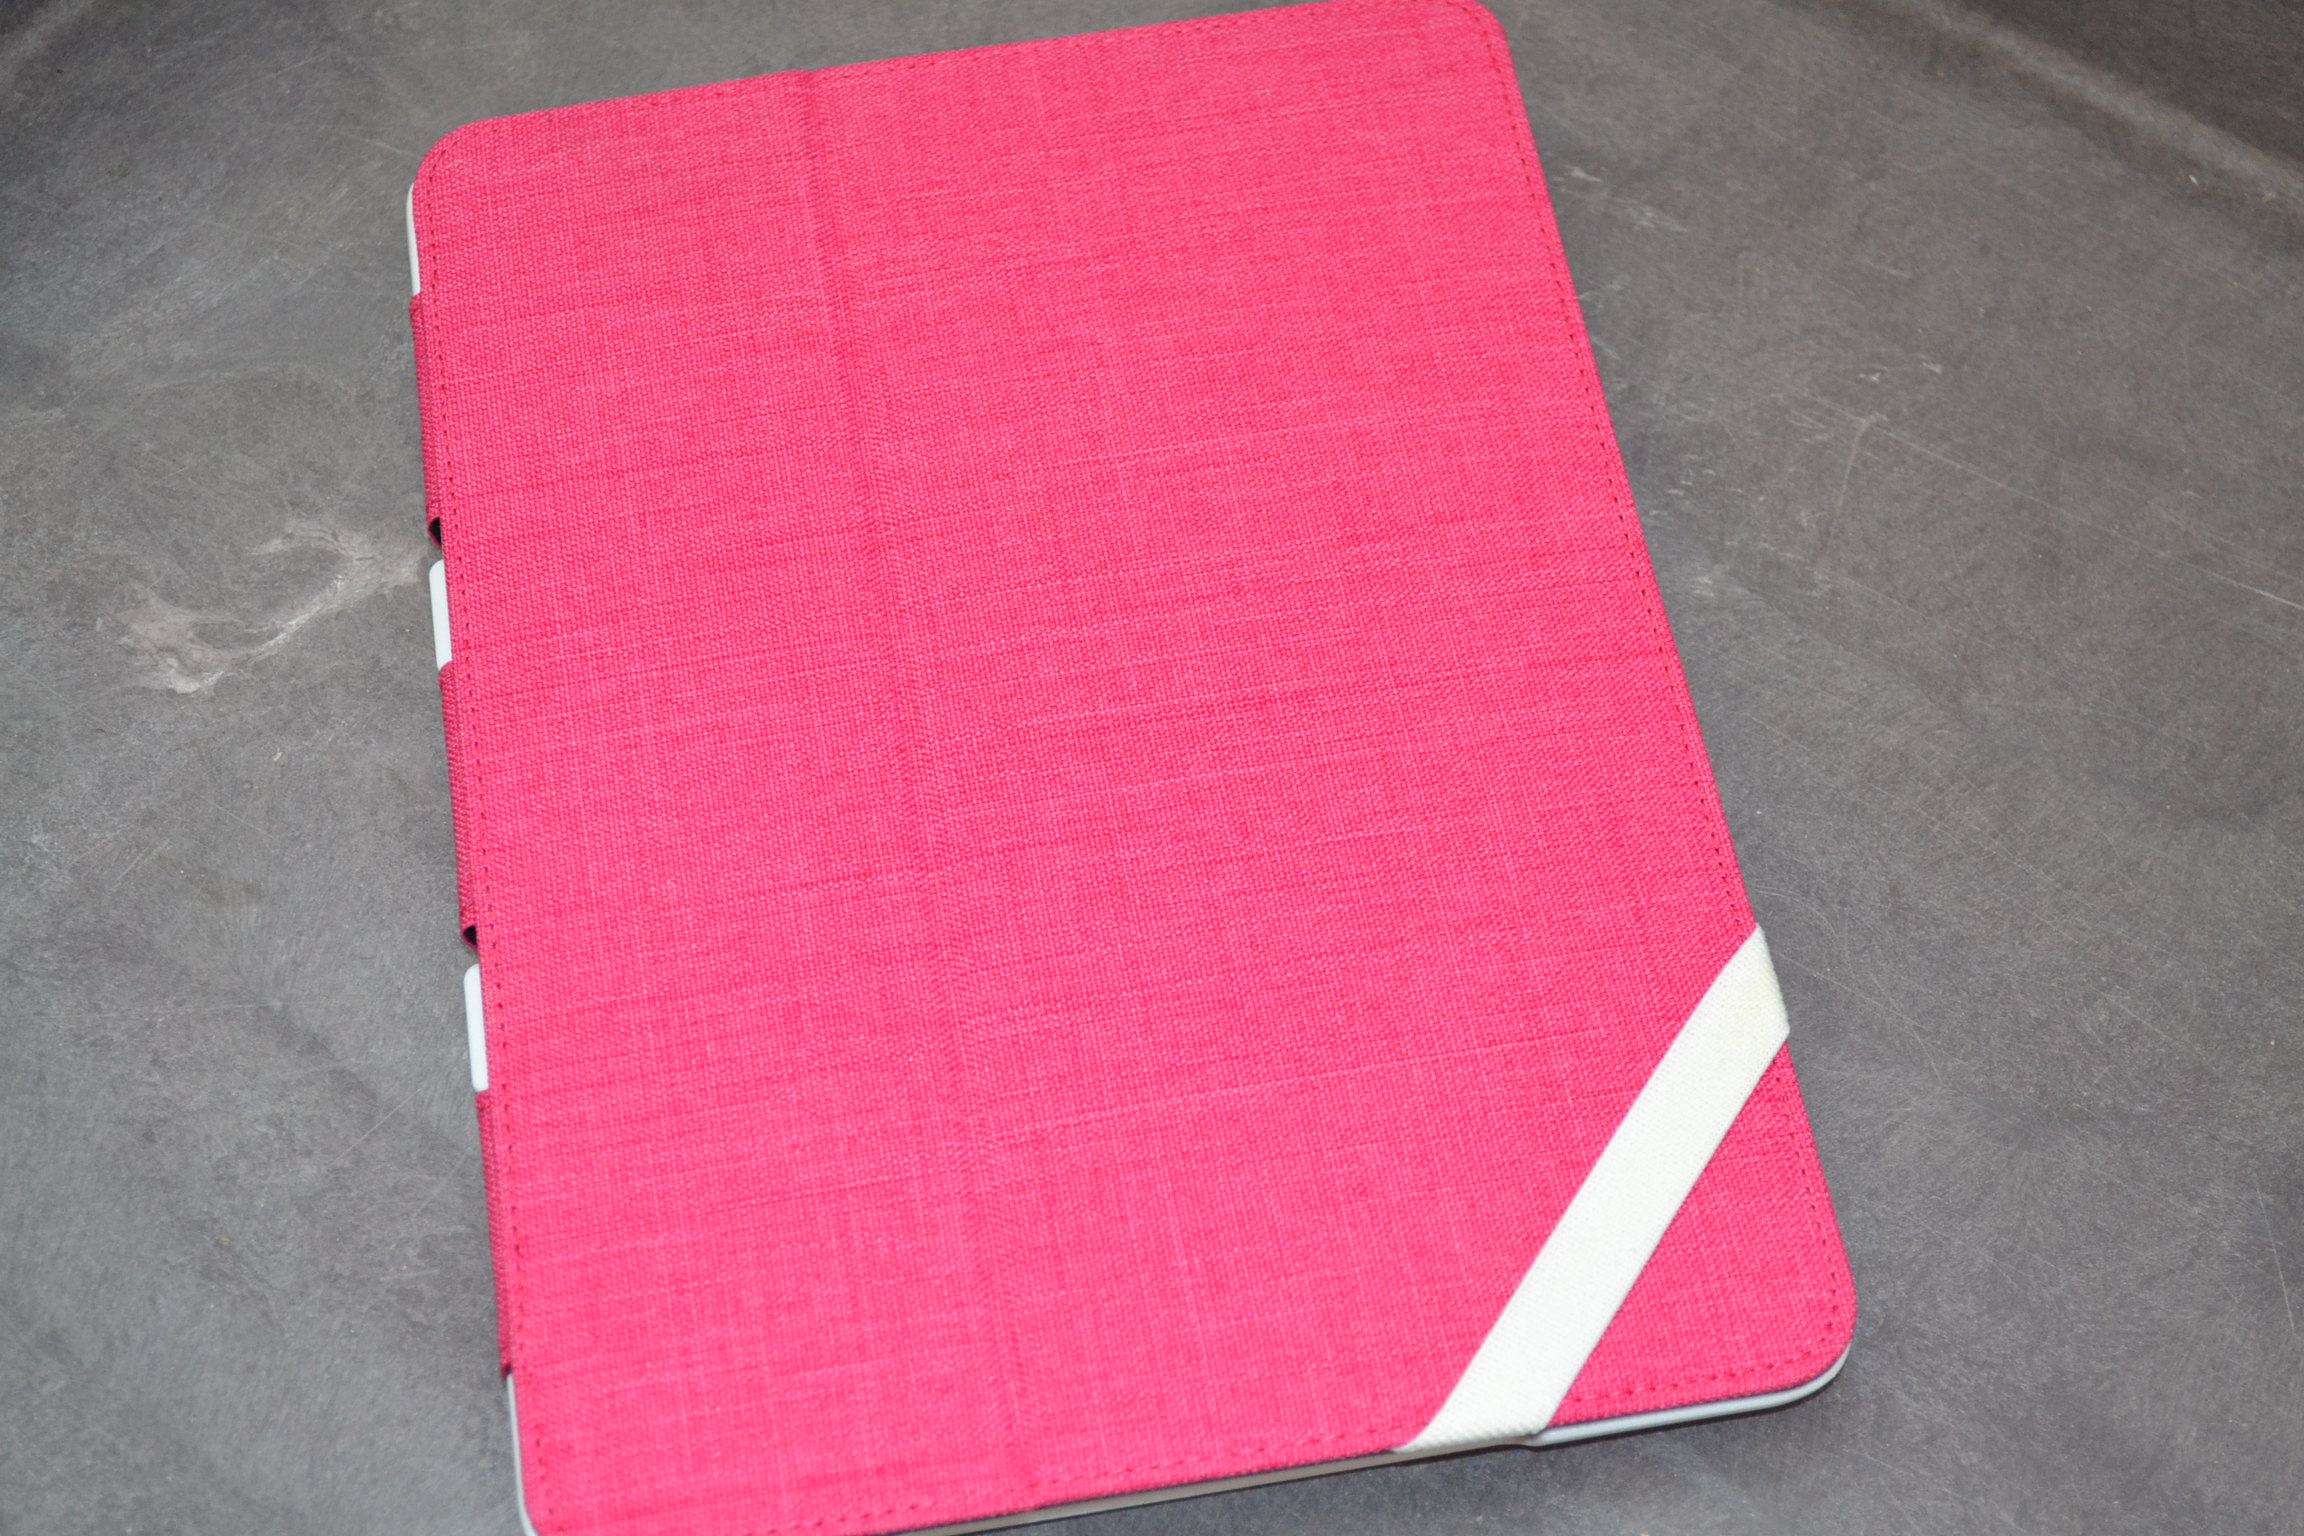 Case Logic Snap View Folio For Galaxy Tab 3 Phlox FSG-1073 Cover Pink